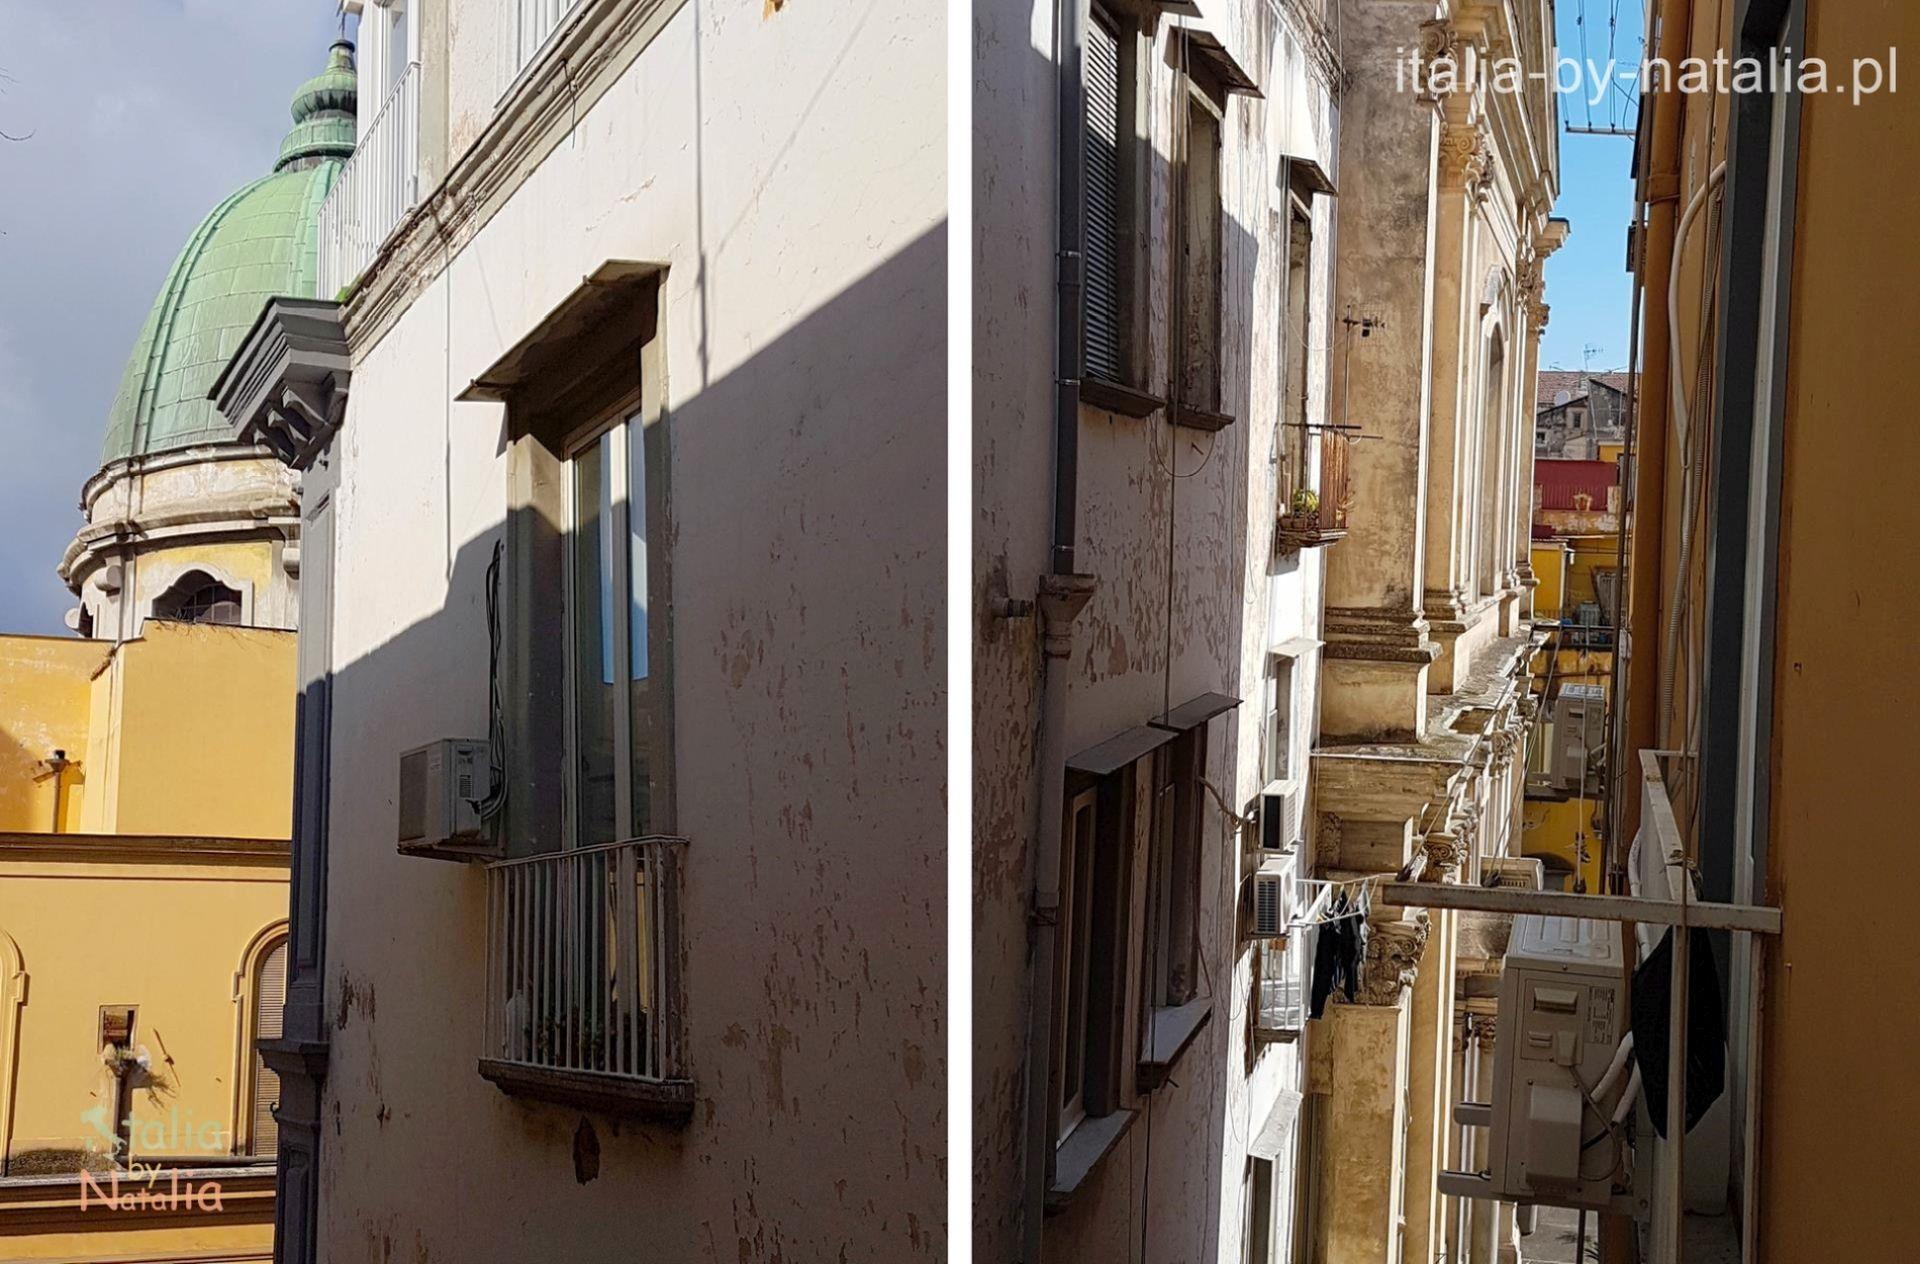 Neapol widok z okna